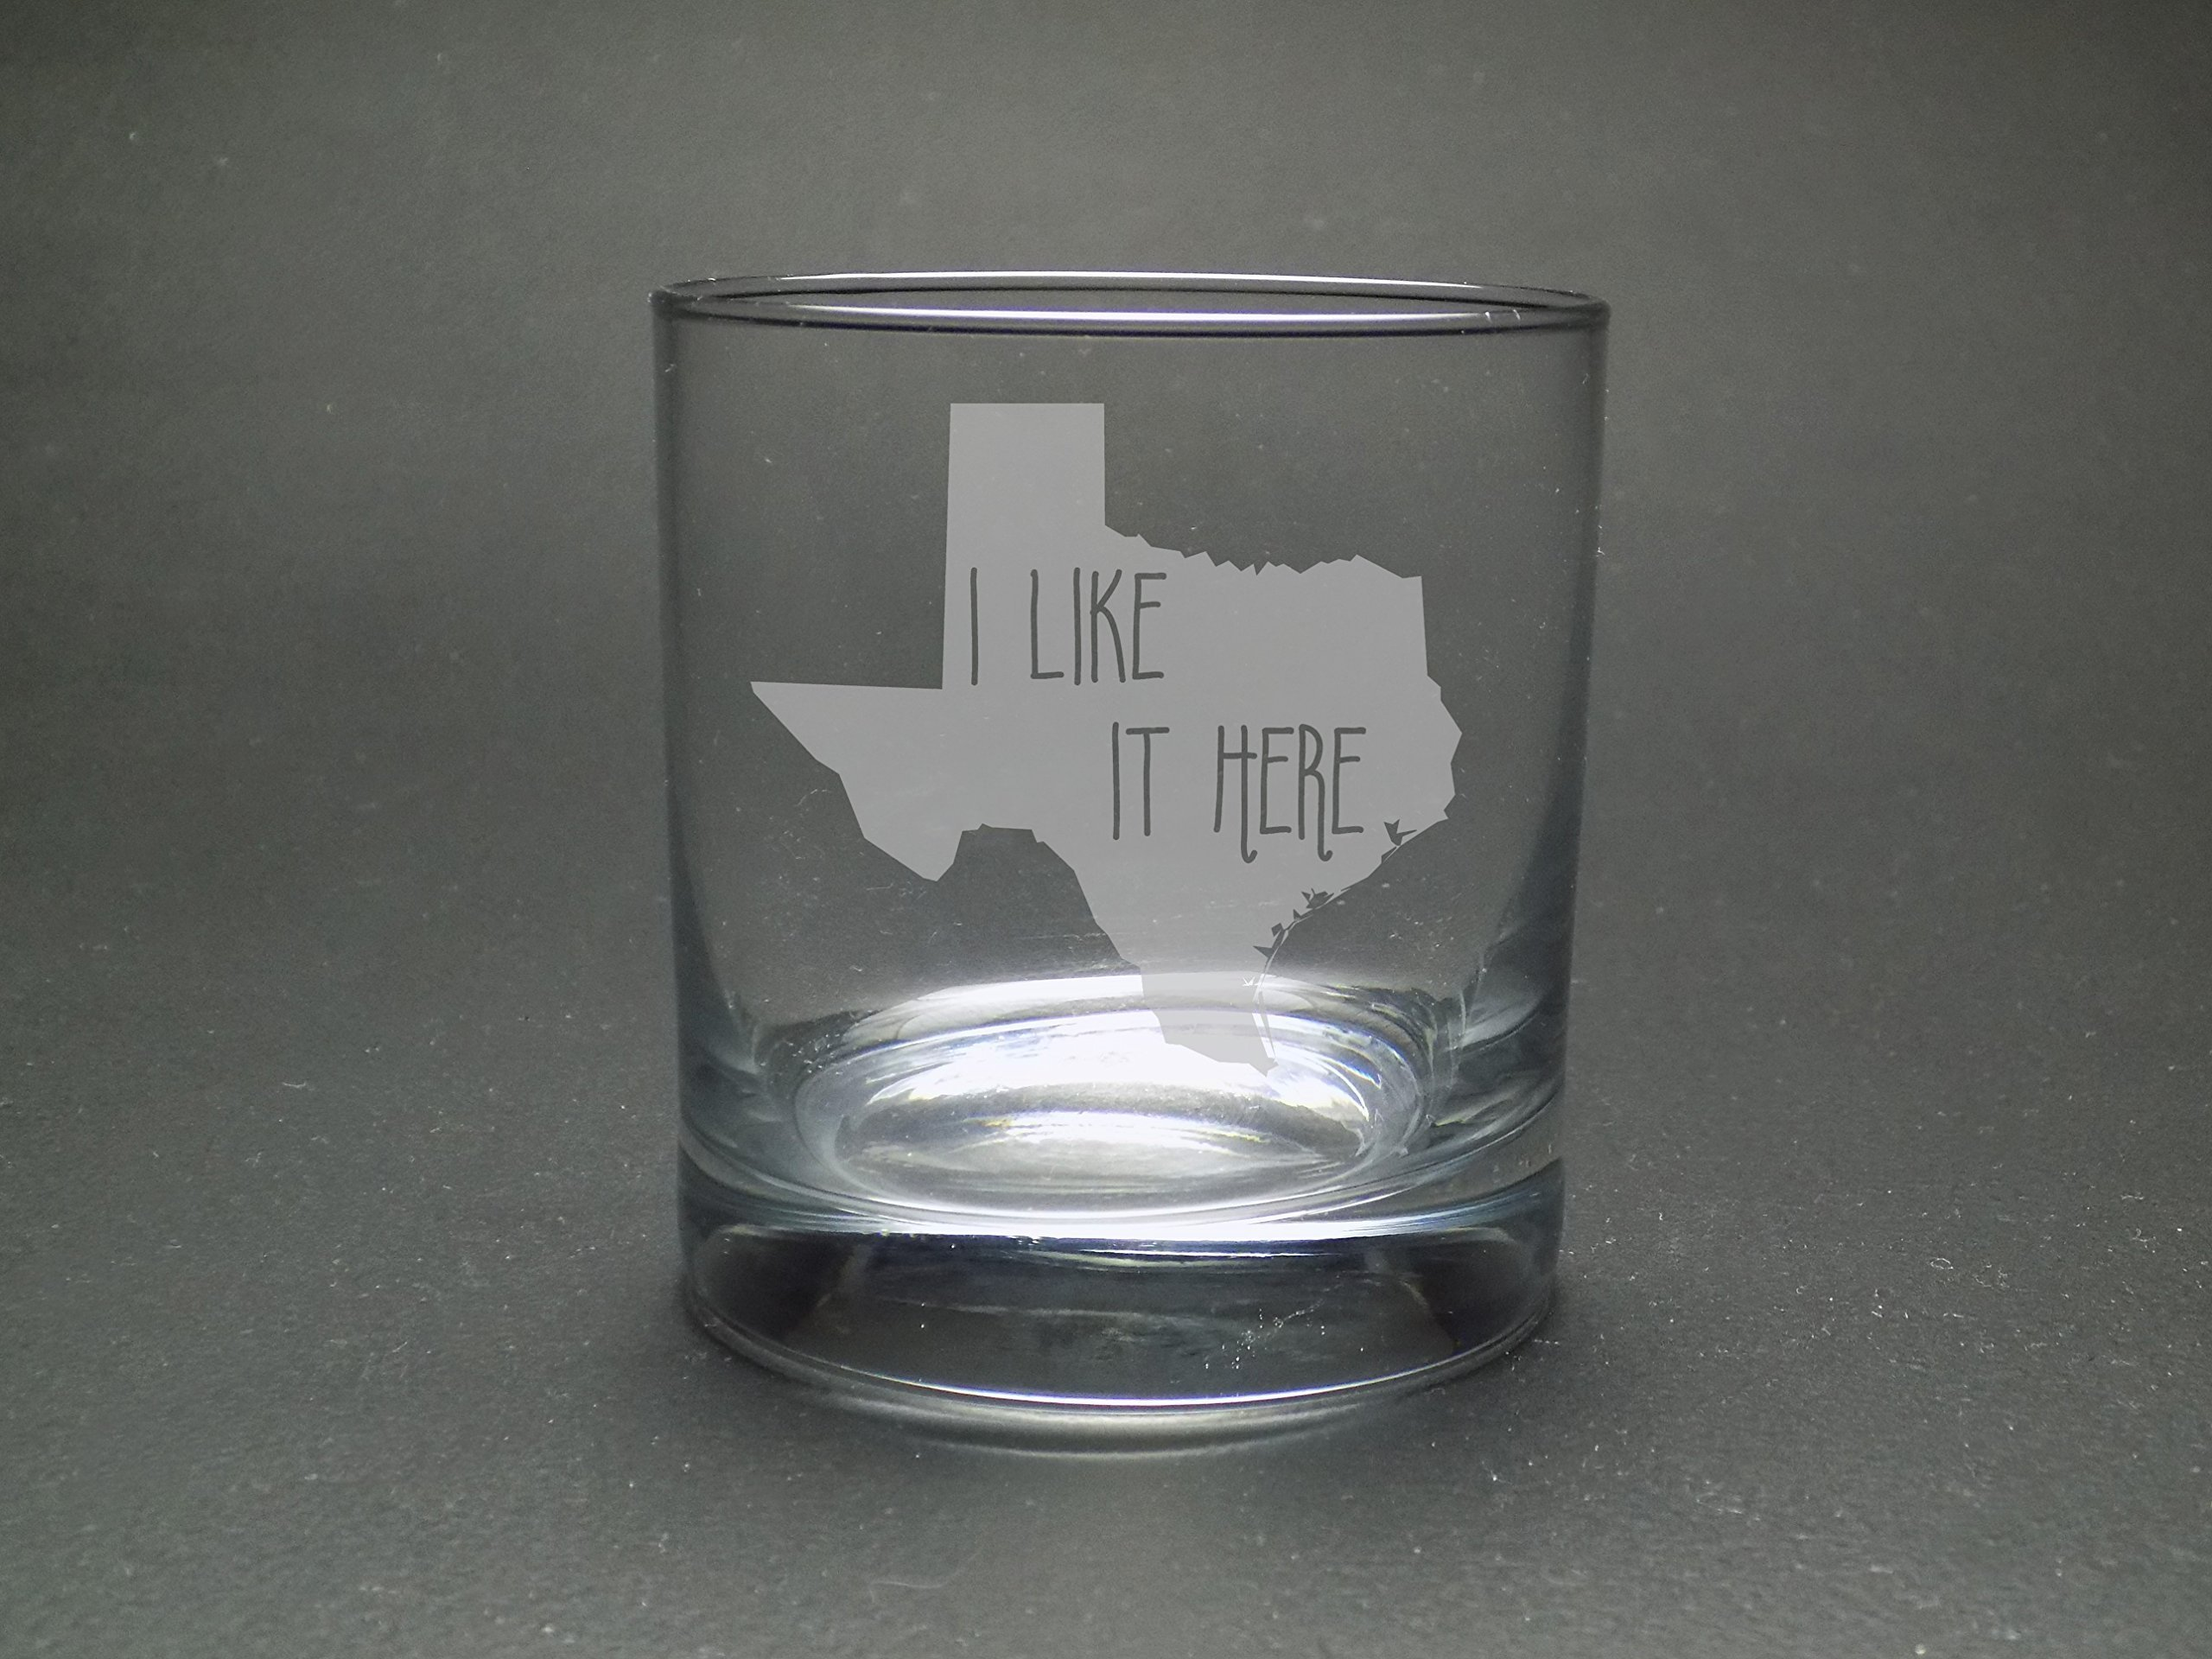 Texas I Like It Here Rocks Glass - Home Rocks Glass - Moving Gift - Housewarming Gift - Graduation Gift - Texas Rocks Glass